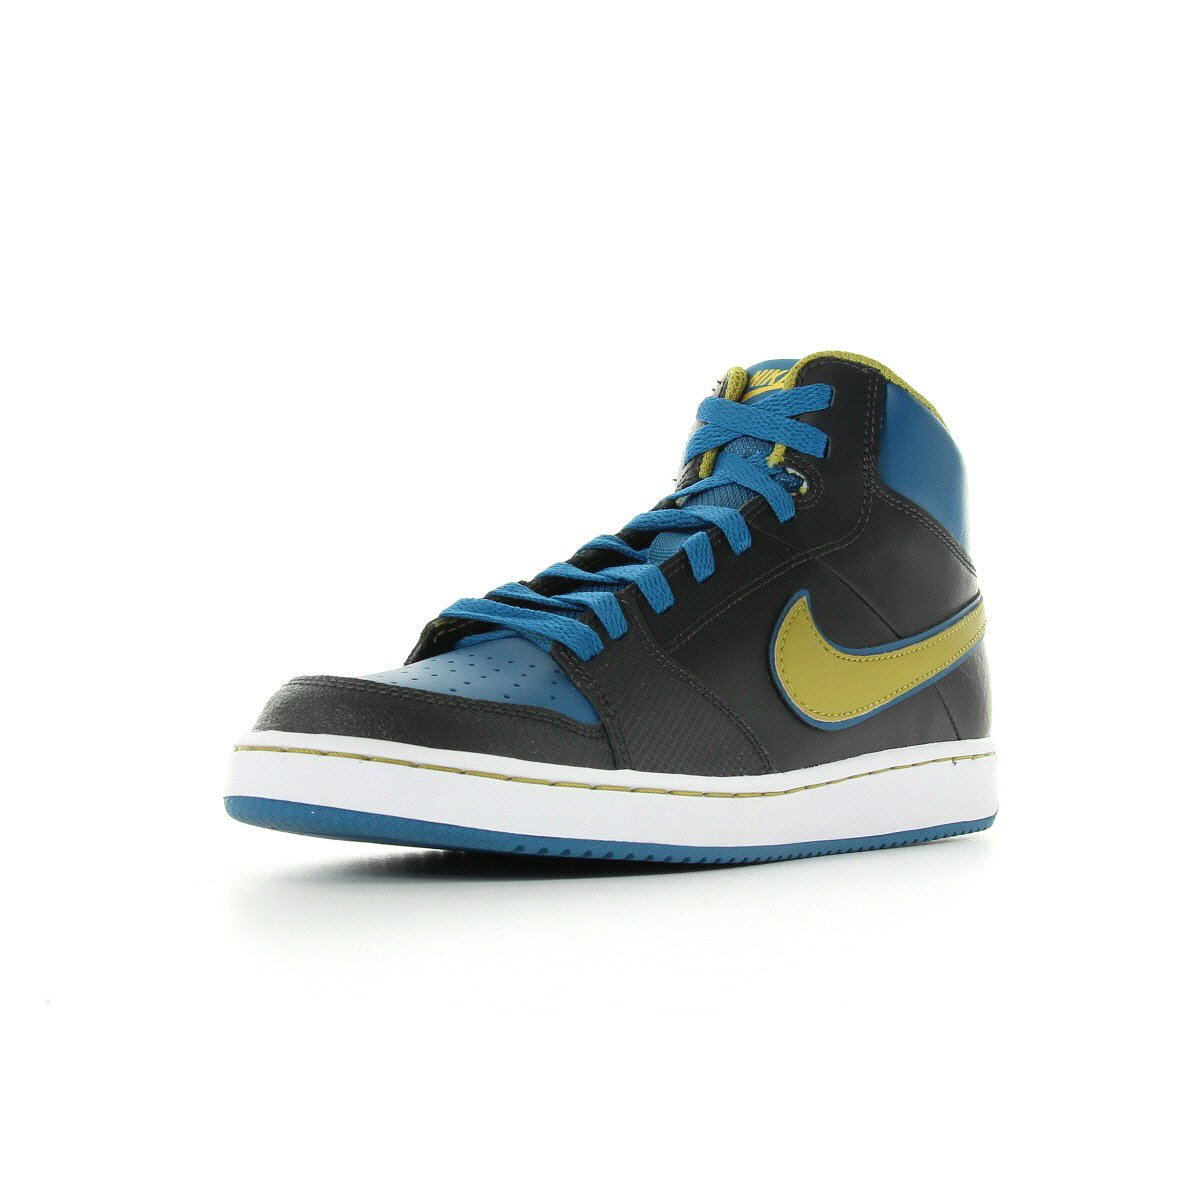 buy online 2e4a1 c6885 Nike Backboard 2 Mid (GS) 488157004, Baskets Mode Enfant - taille 40   Amazon.fr  Chaussures et Sacs